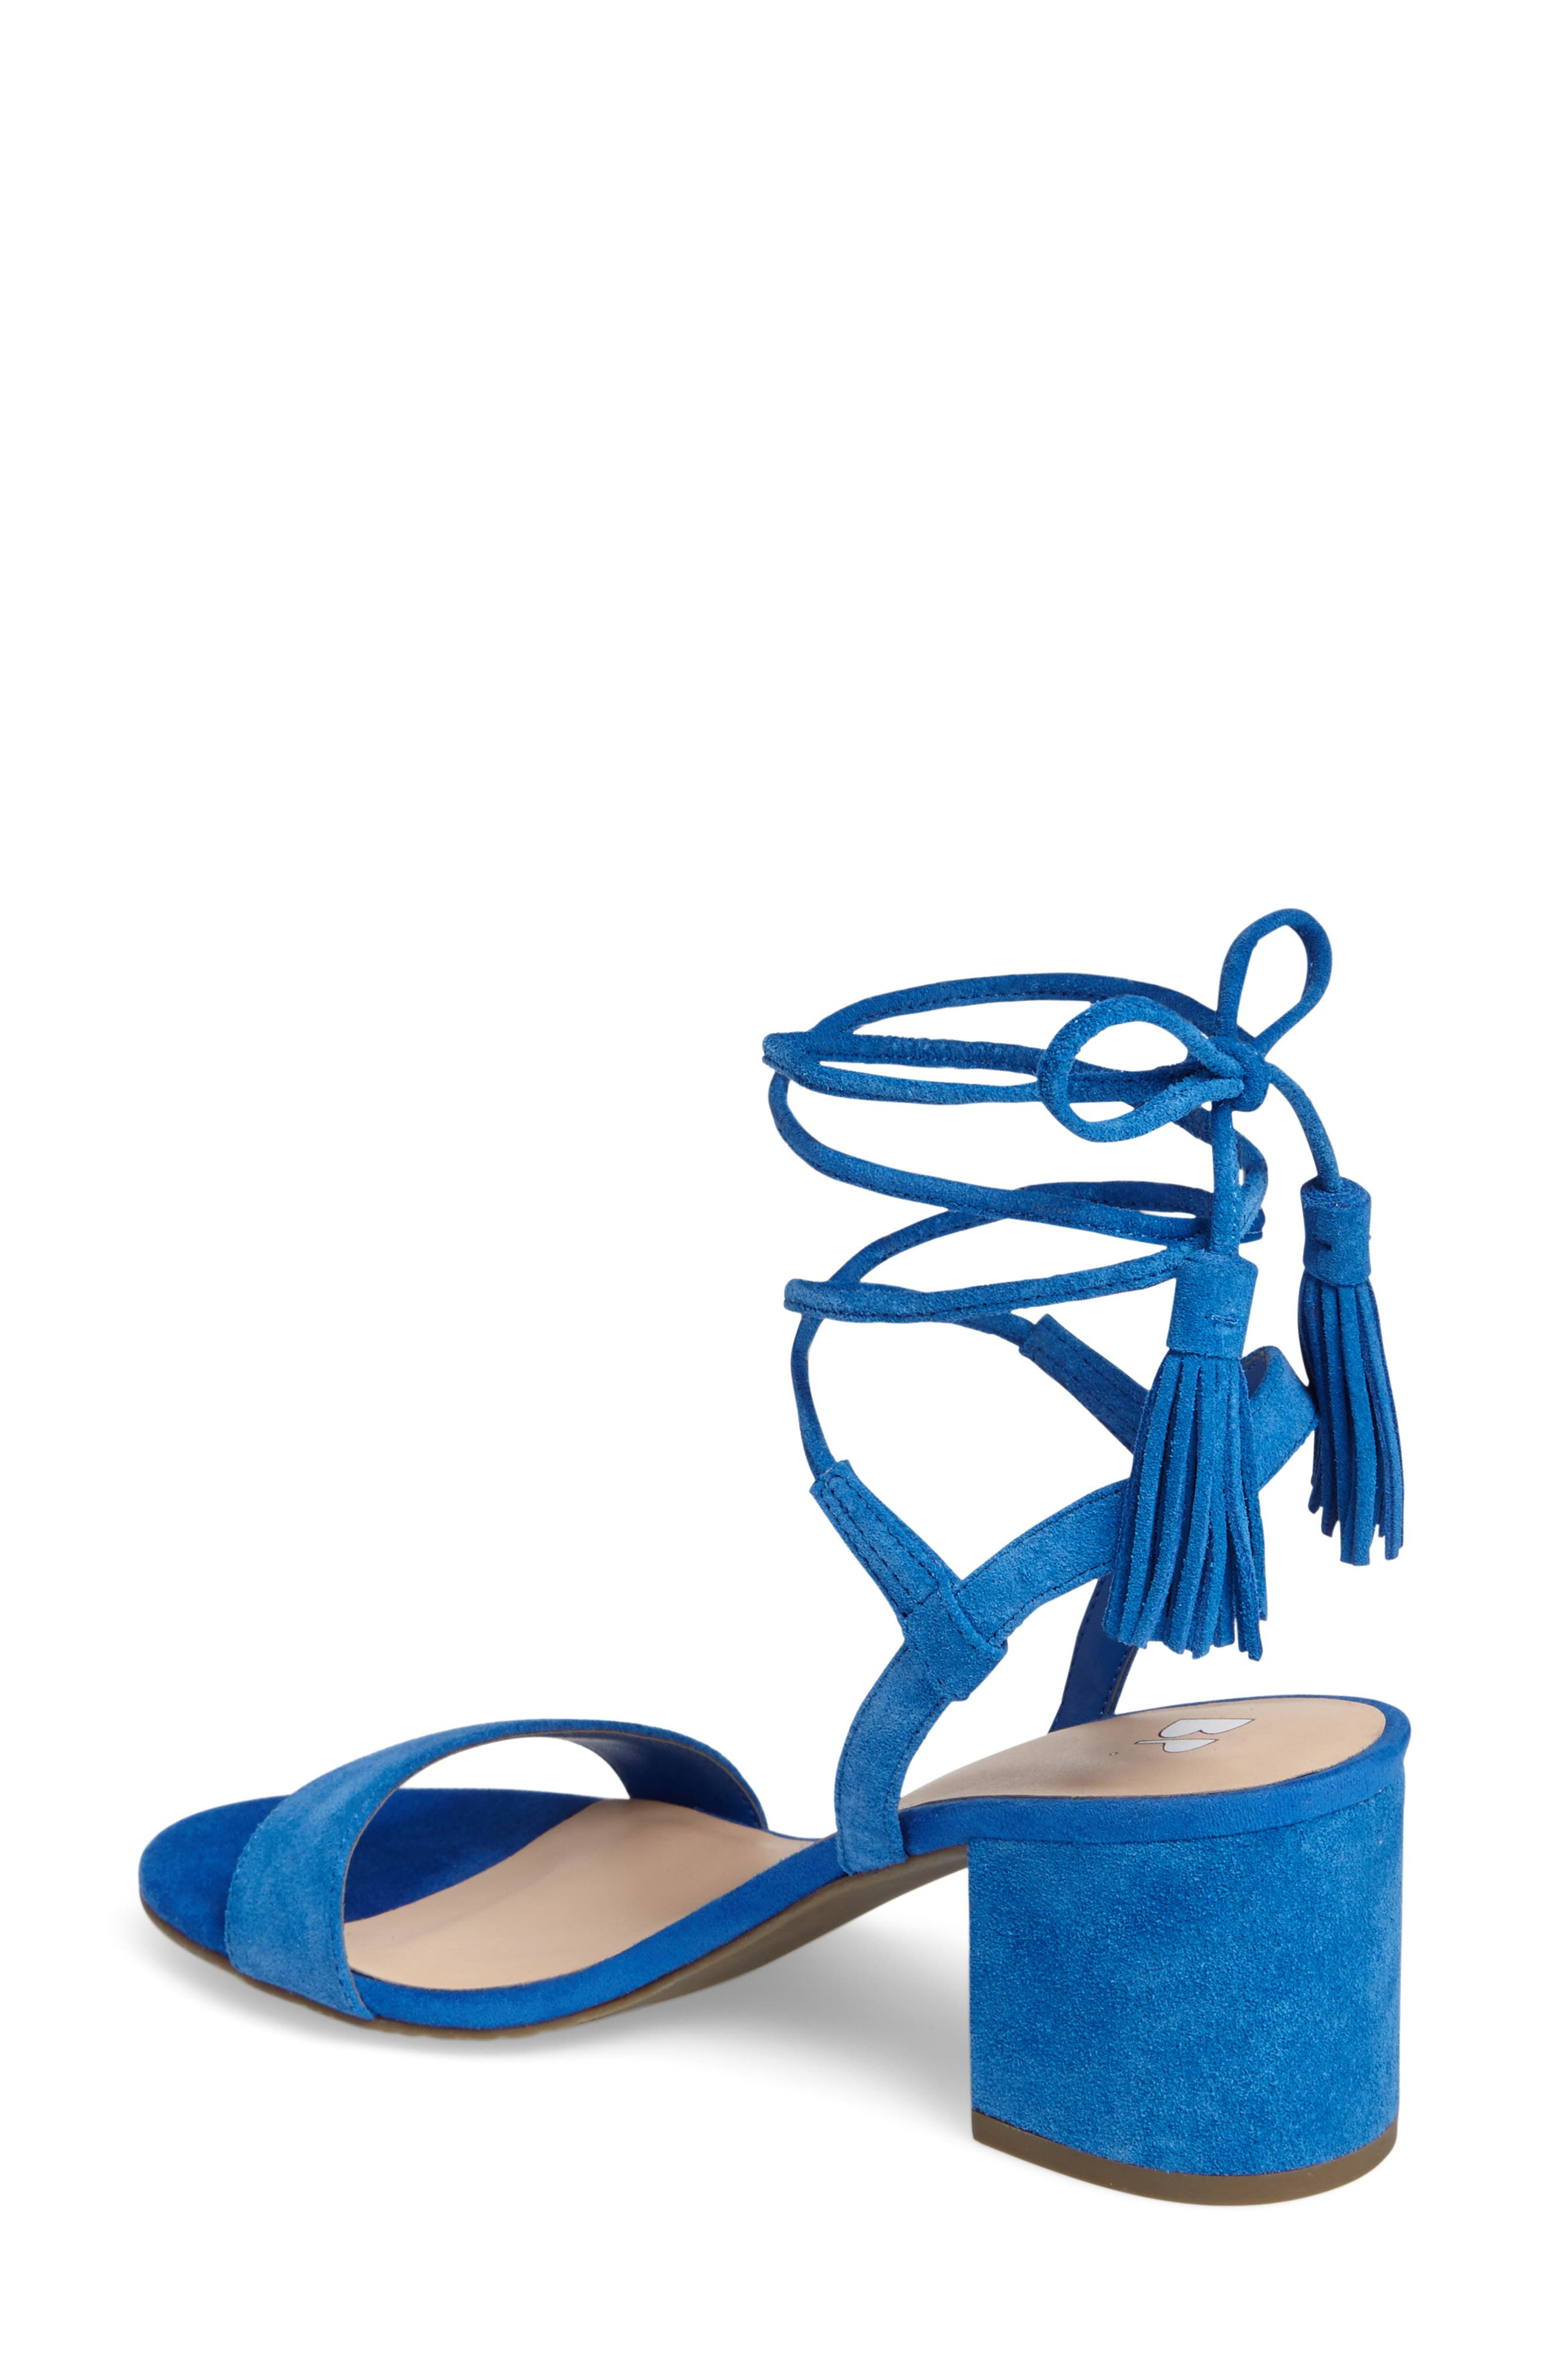 Alternate Image 2  - BP. Karla Block Heel Ankle Wrap Sandal (Women)